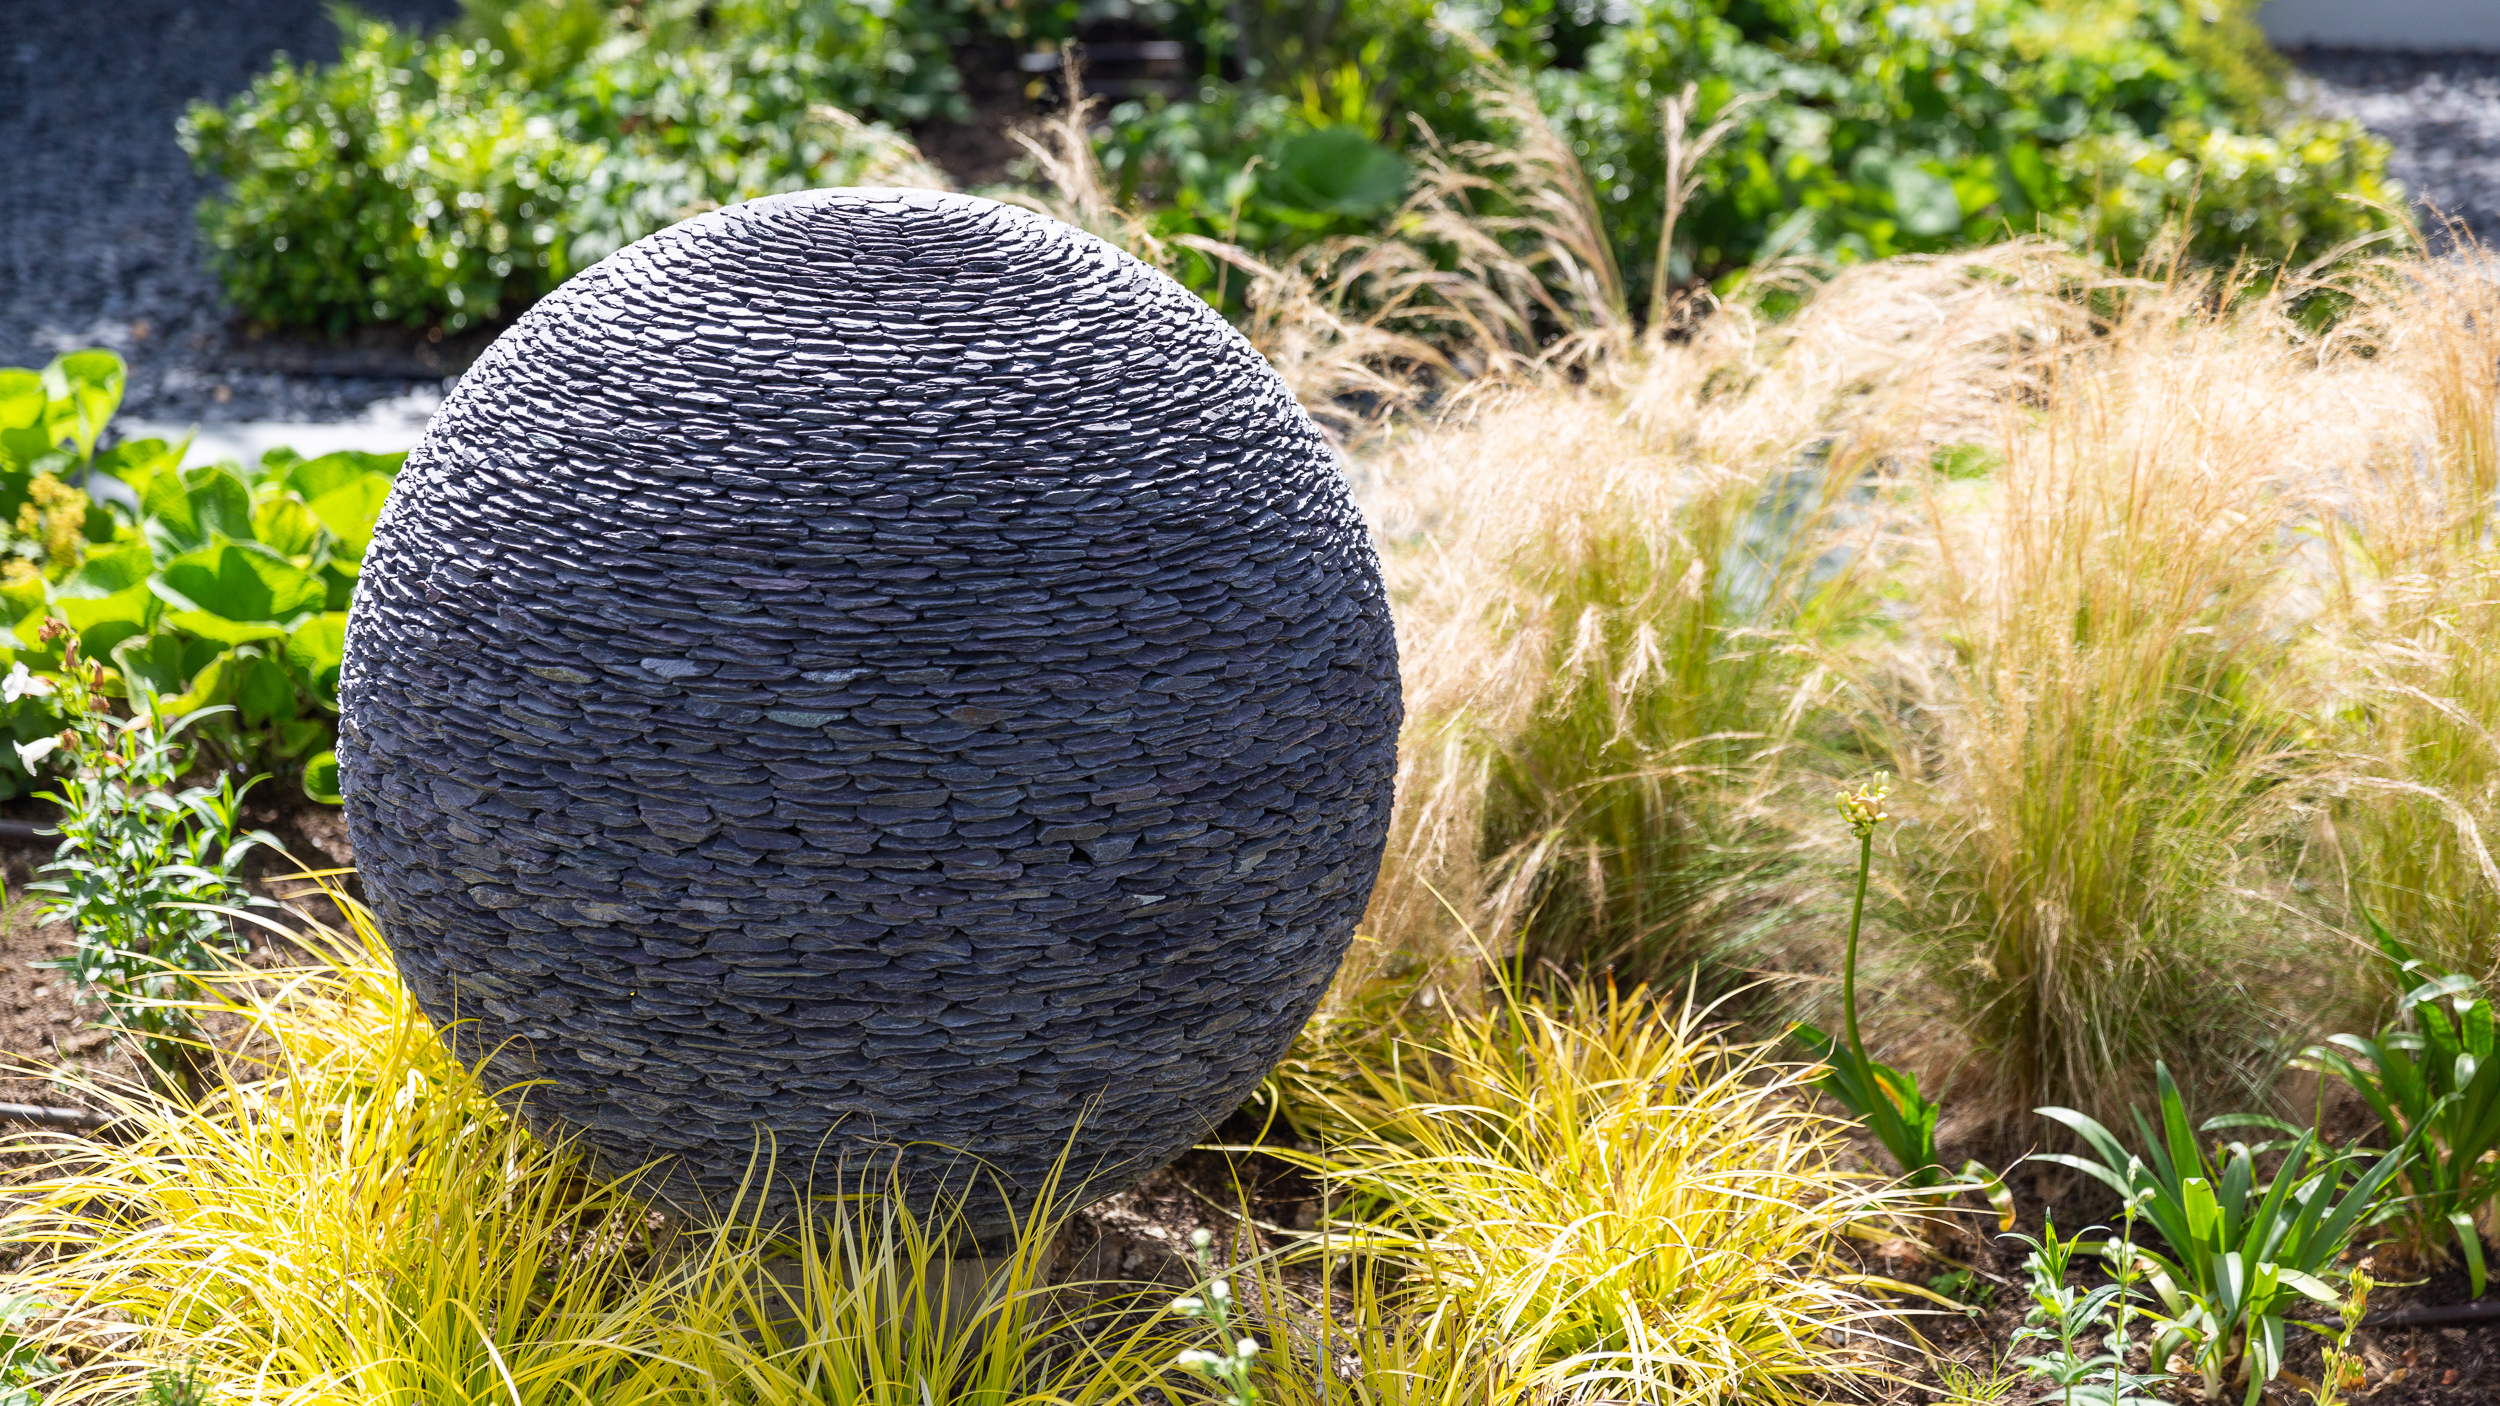 Surrey Sculpture Garden